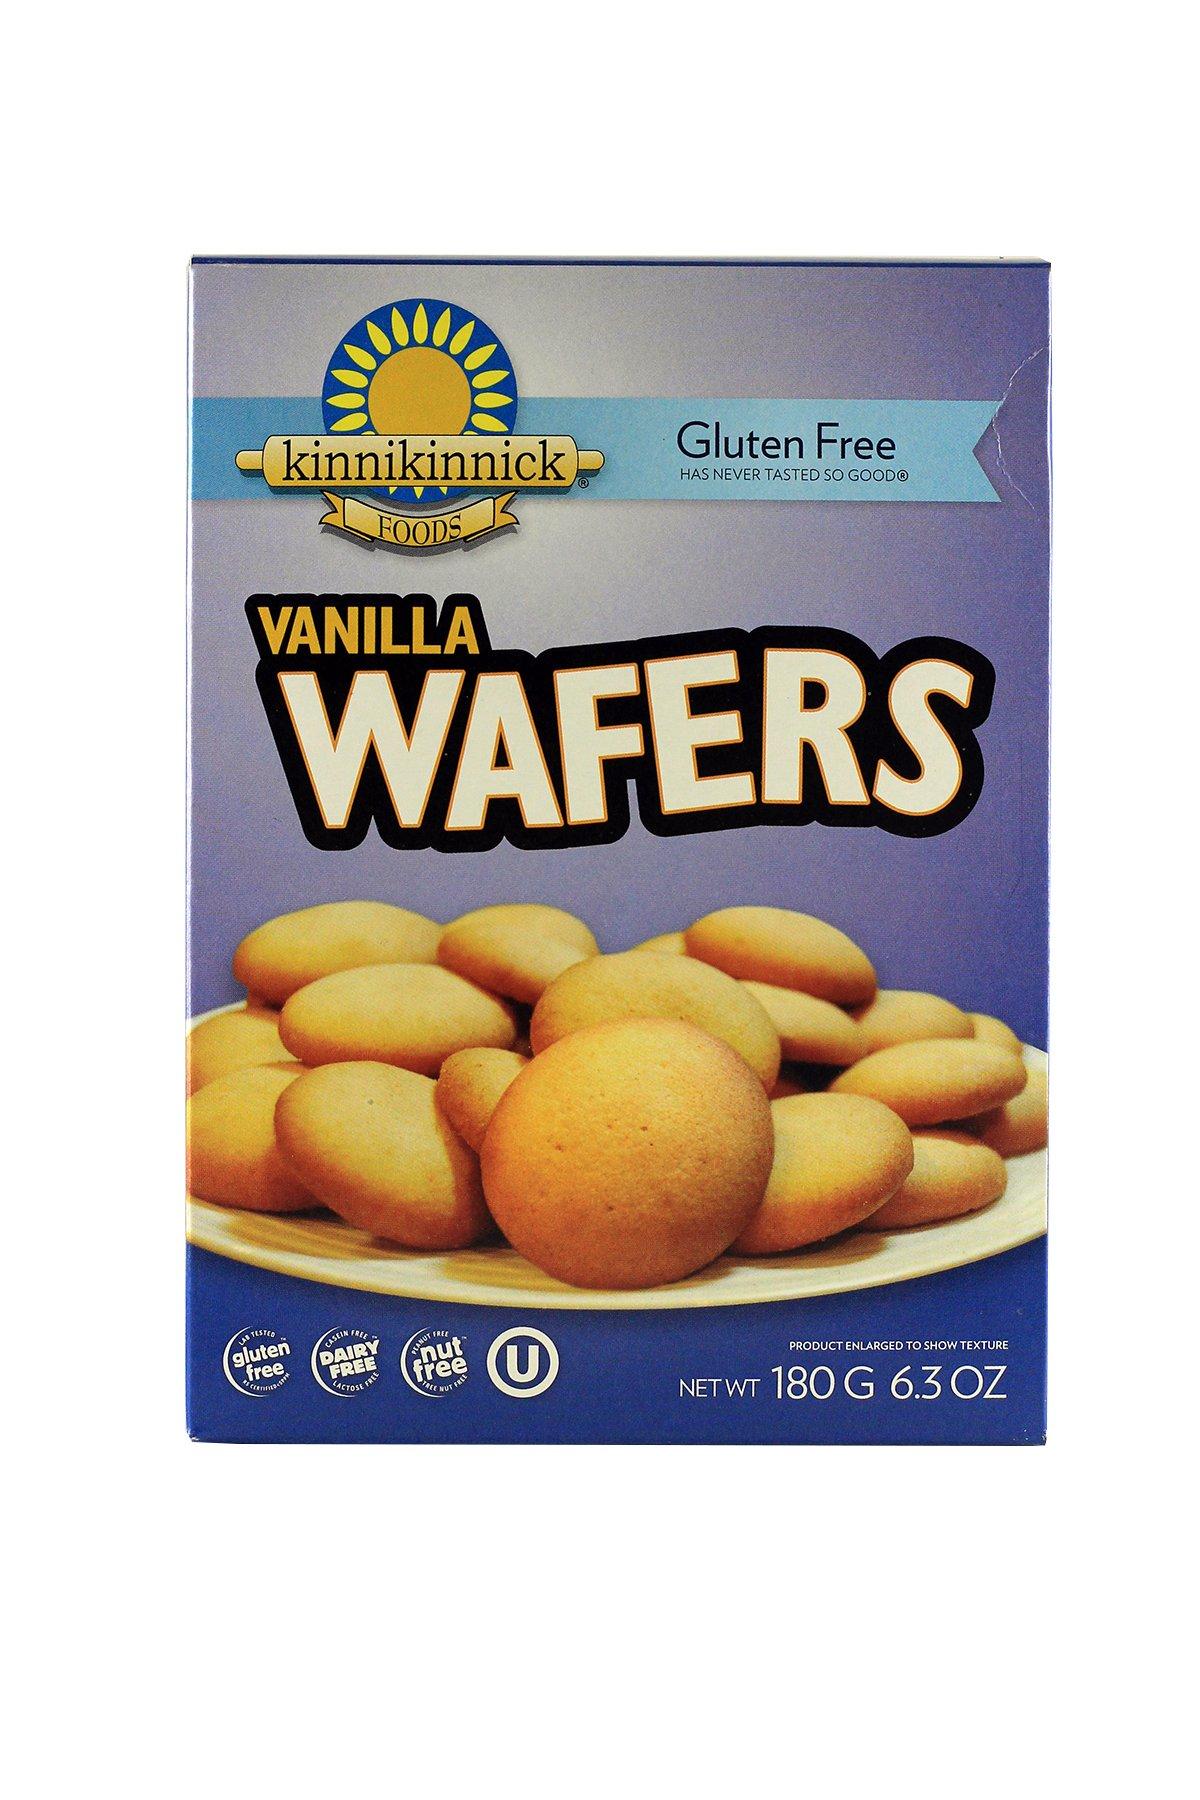 Kinnikinnick Foods, Gluten Free, Vanilla Wafers, 6.3 oz (180g) Kinnikinnick Foods, Gluten Free, Vanilla Wafers, 6.3 oz (180g) - 2pcs